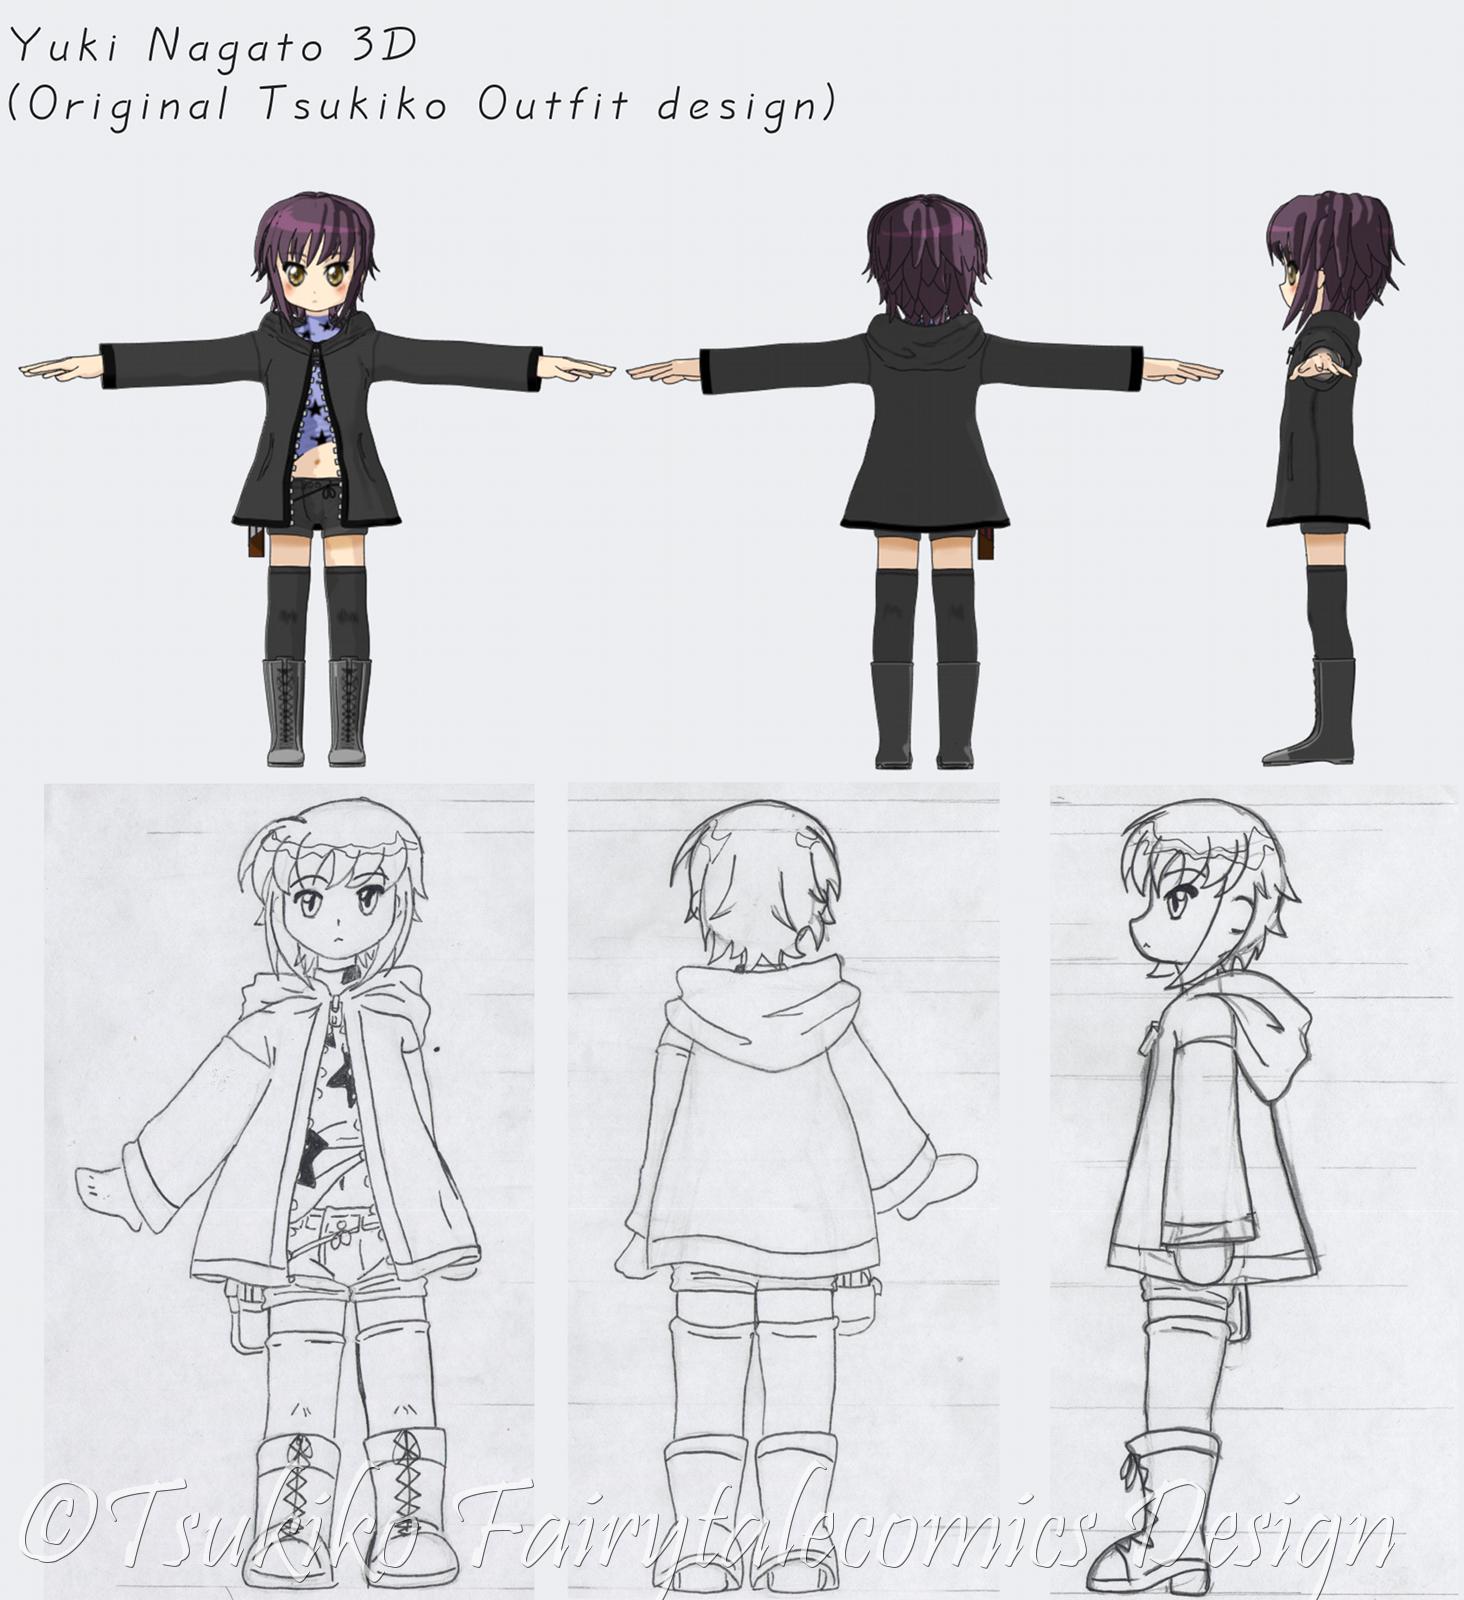 anime 3d model sheet Google Search Blueprints